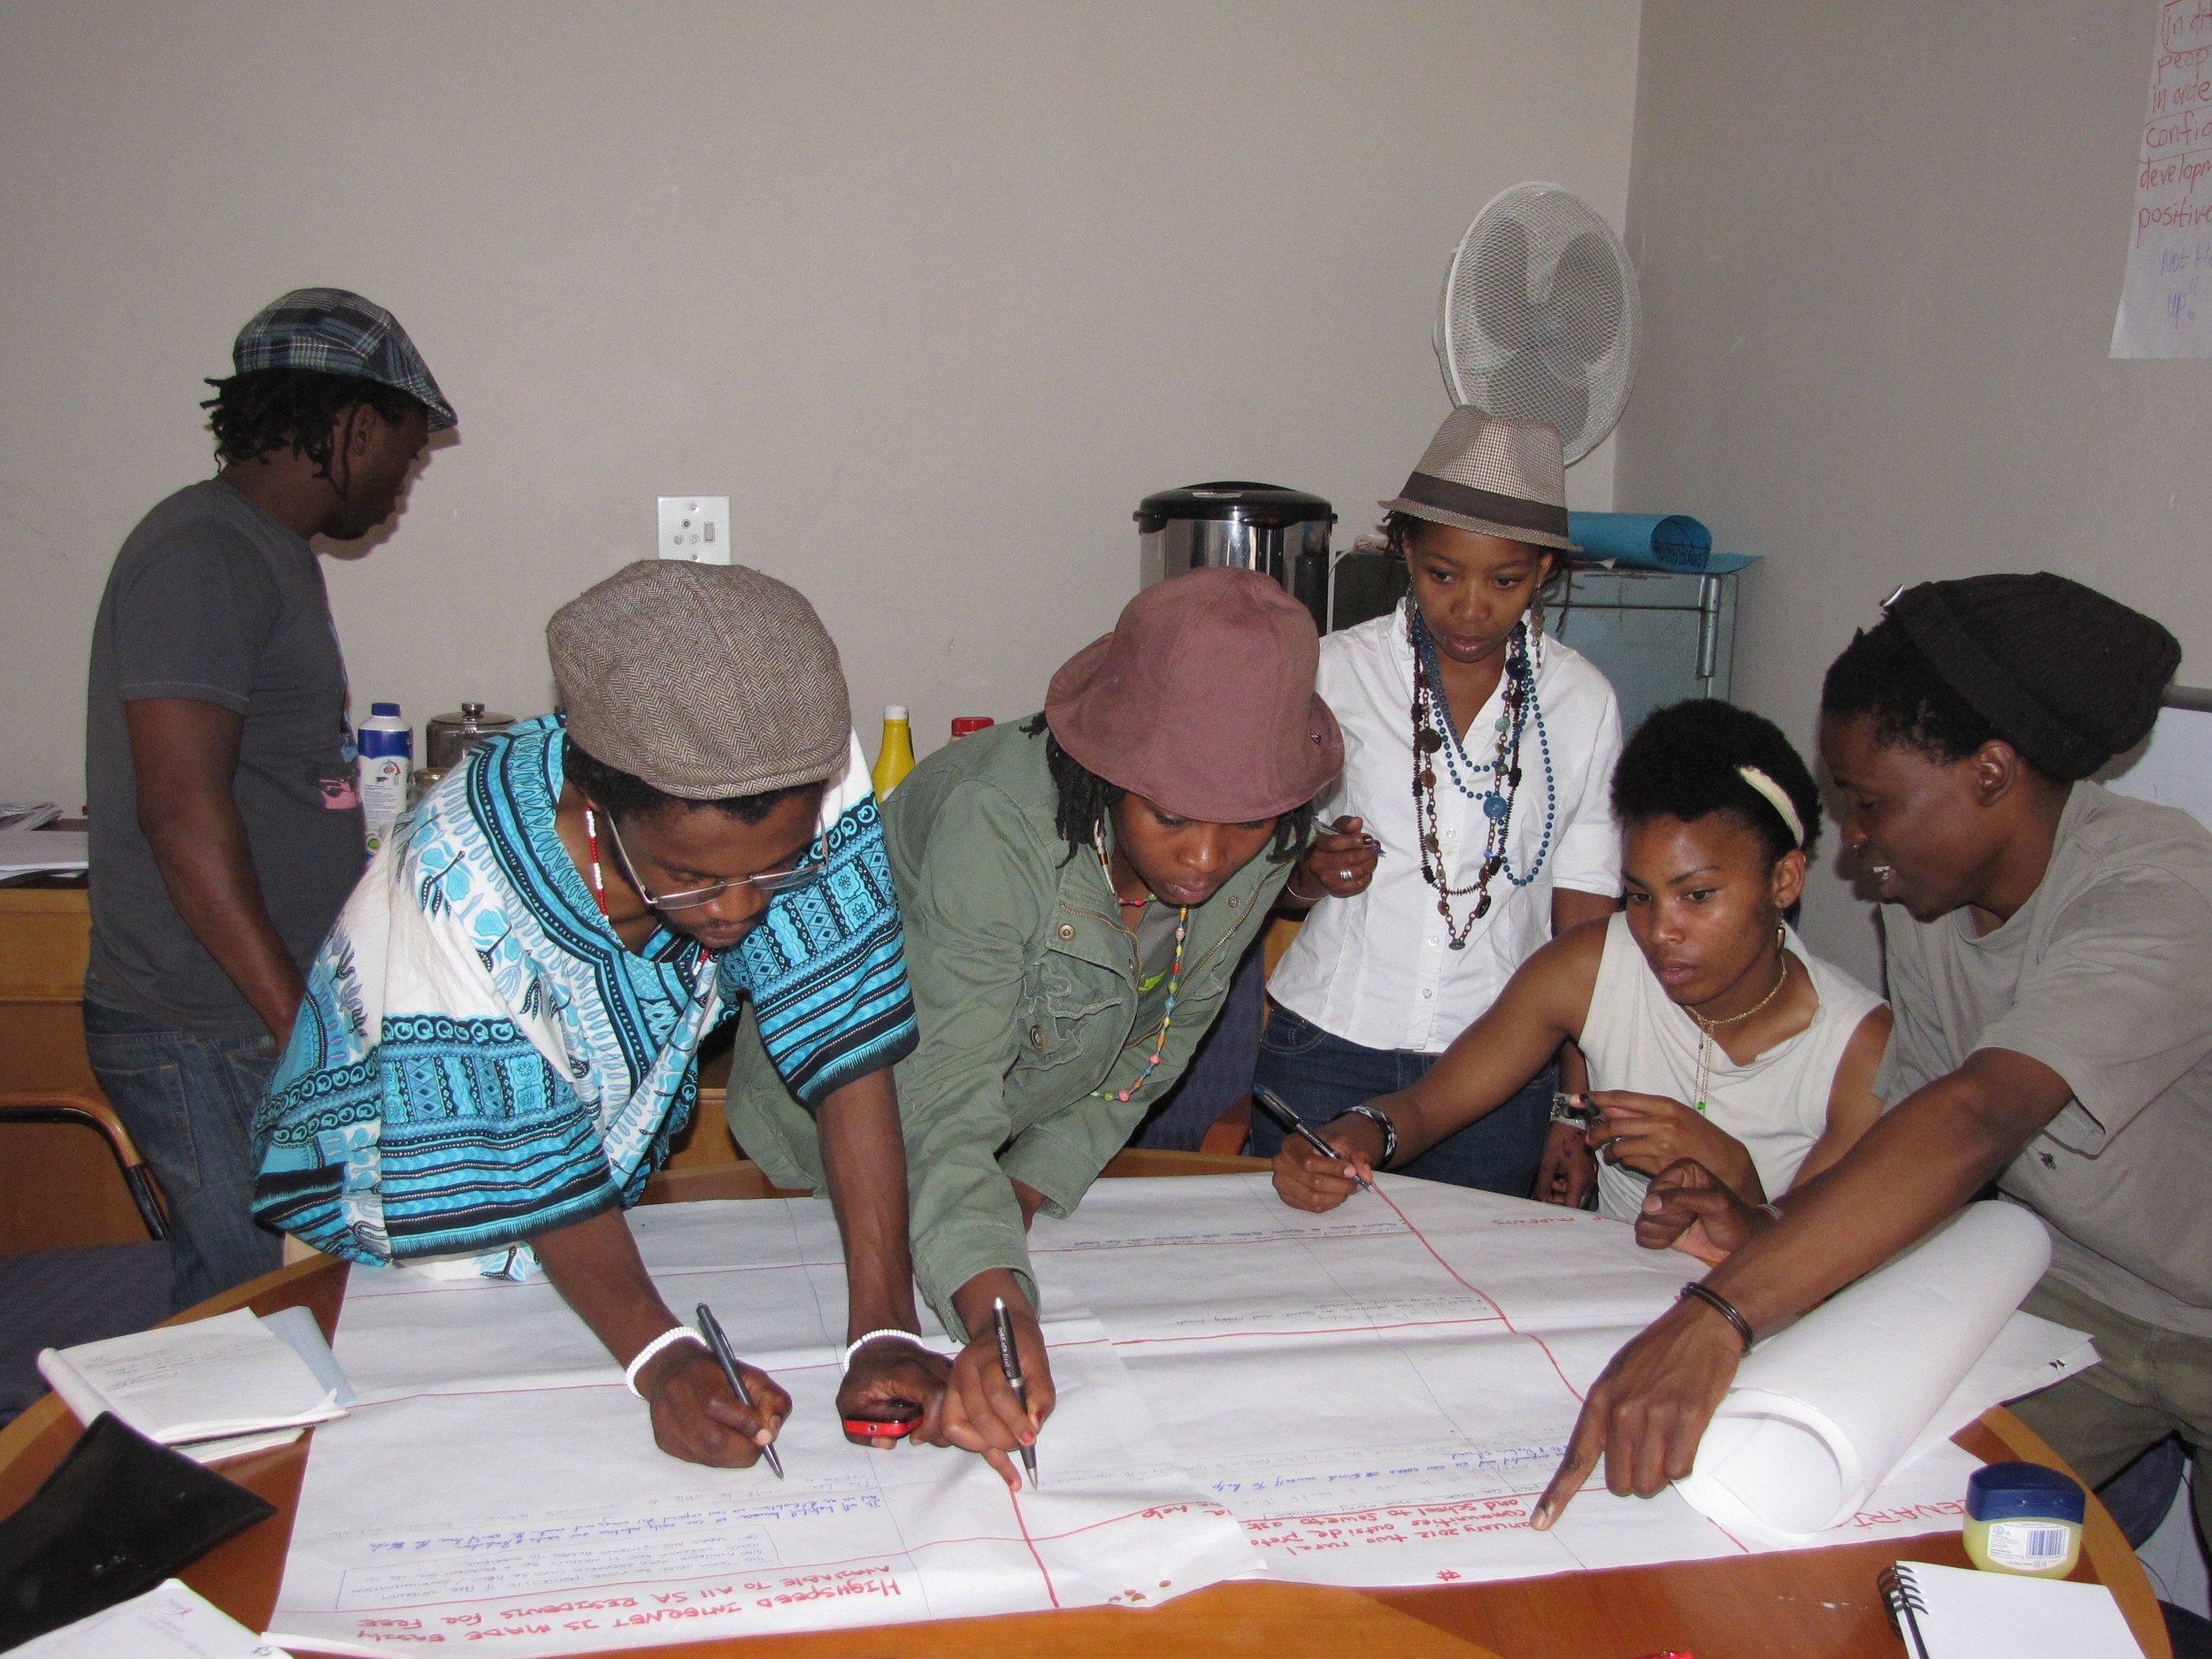 Social Enterprise & Entrepreneurship - South Africa